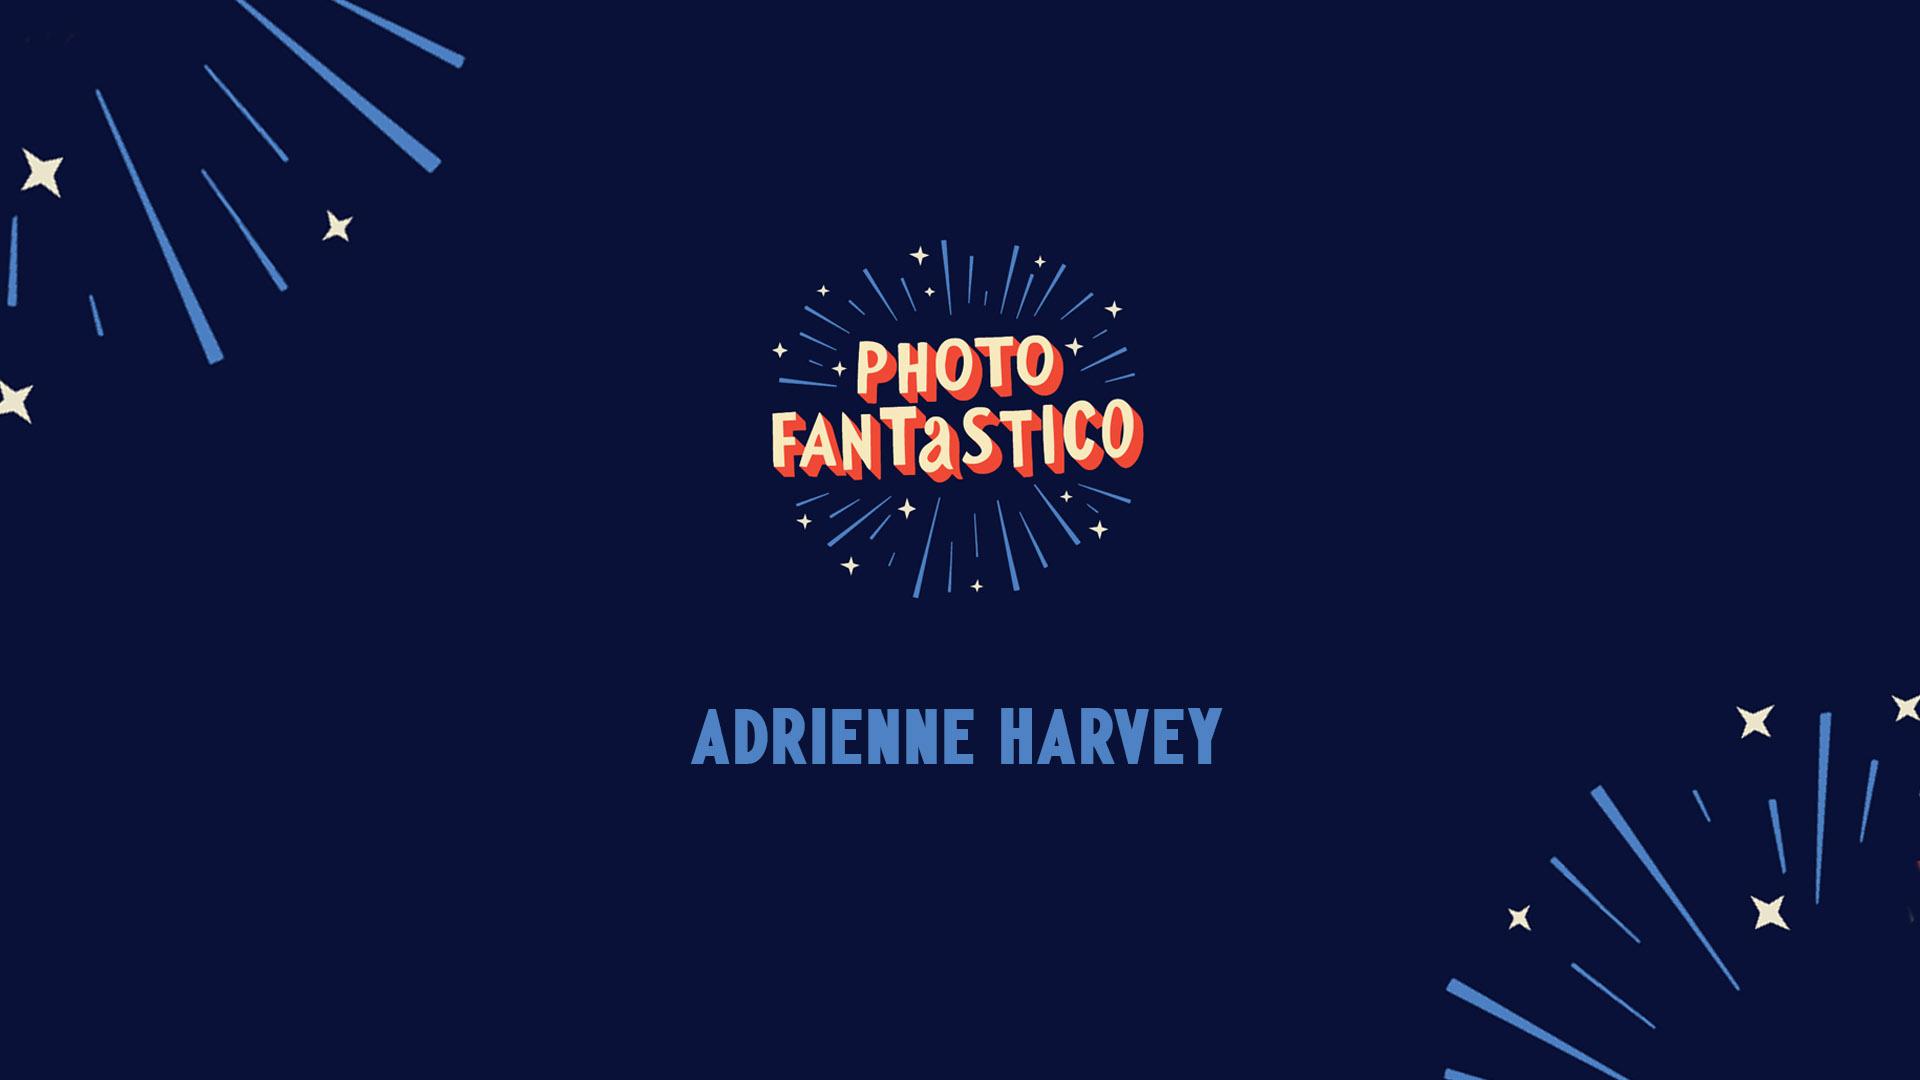 Adrienne Harvey